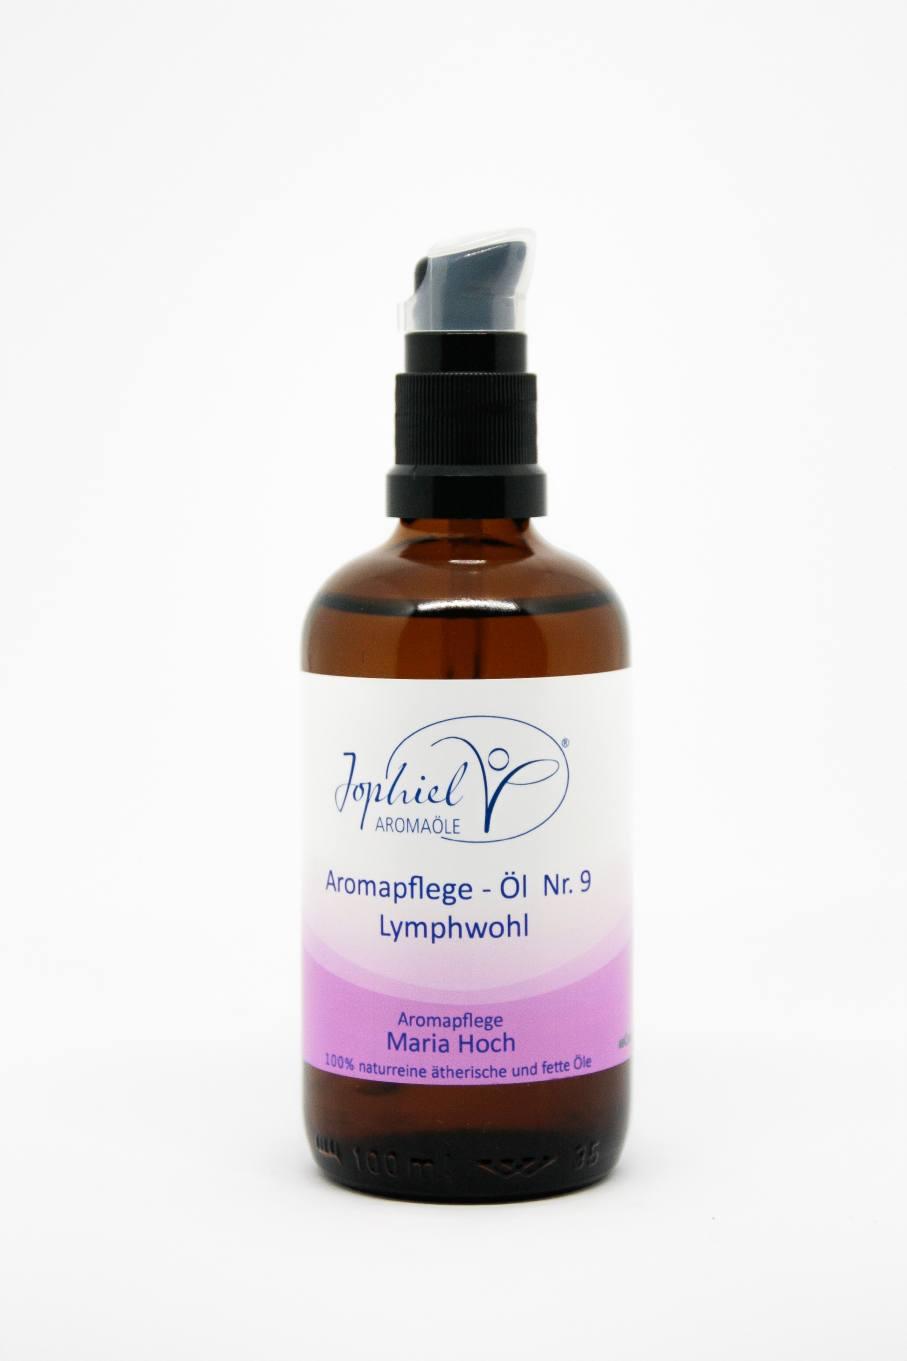 Aromapflege-Öl Nr. 09 Lymphwohl 100 ml